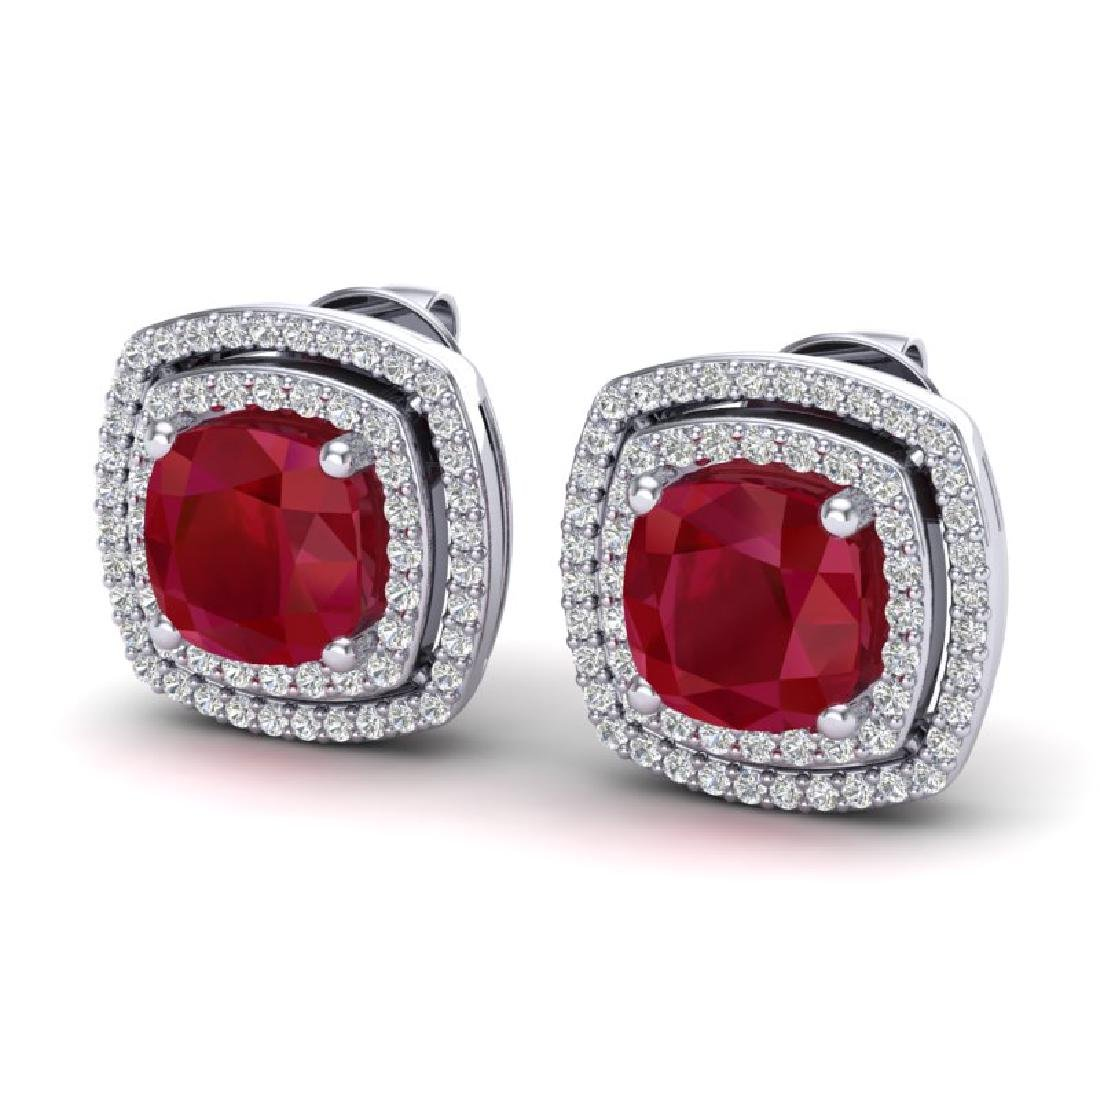 4.95 CTW Ruby & Micro Pave VS/SI Diamond Halo Earrings